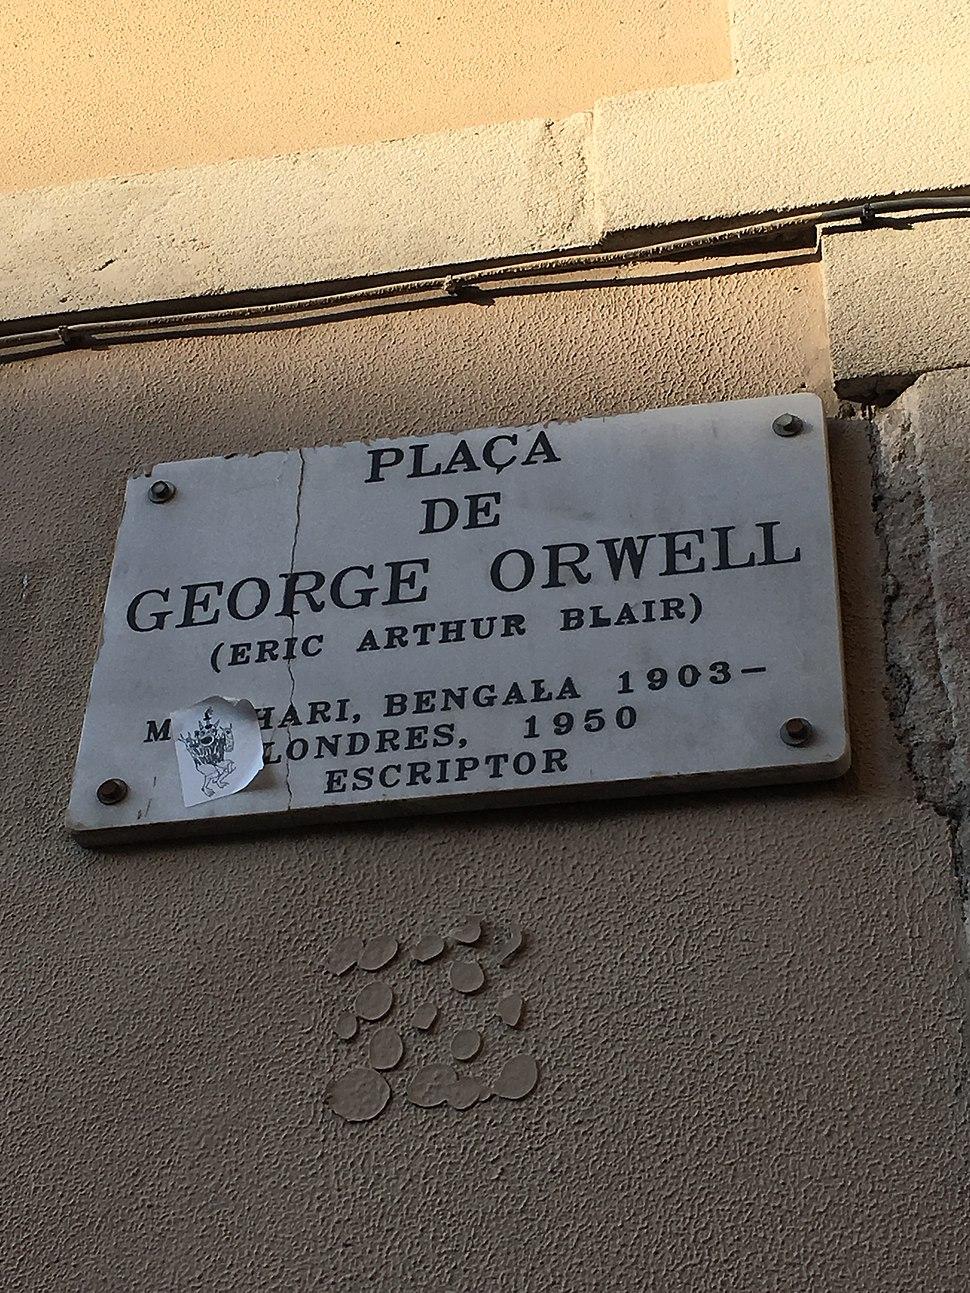 Placa de George Orwell in Barcelona 3